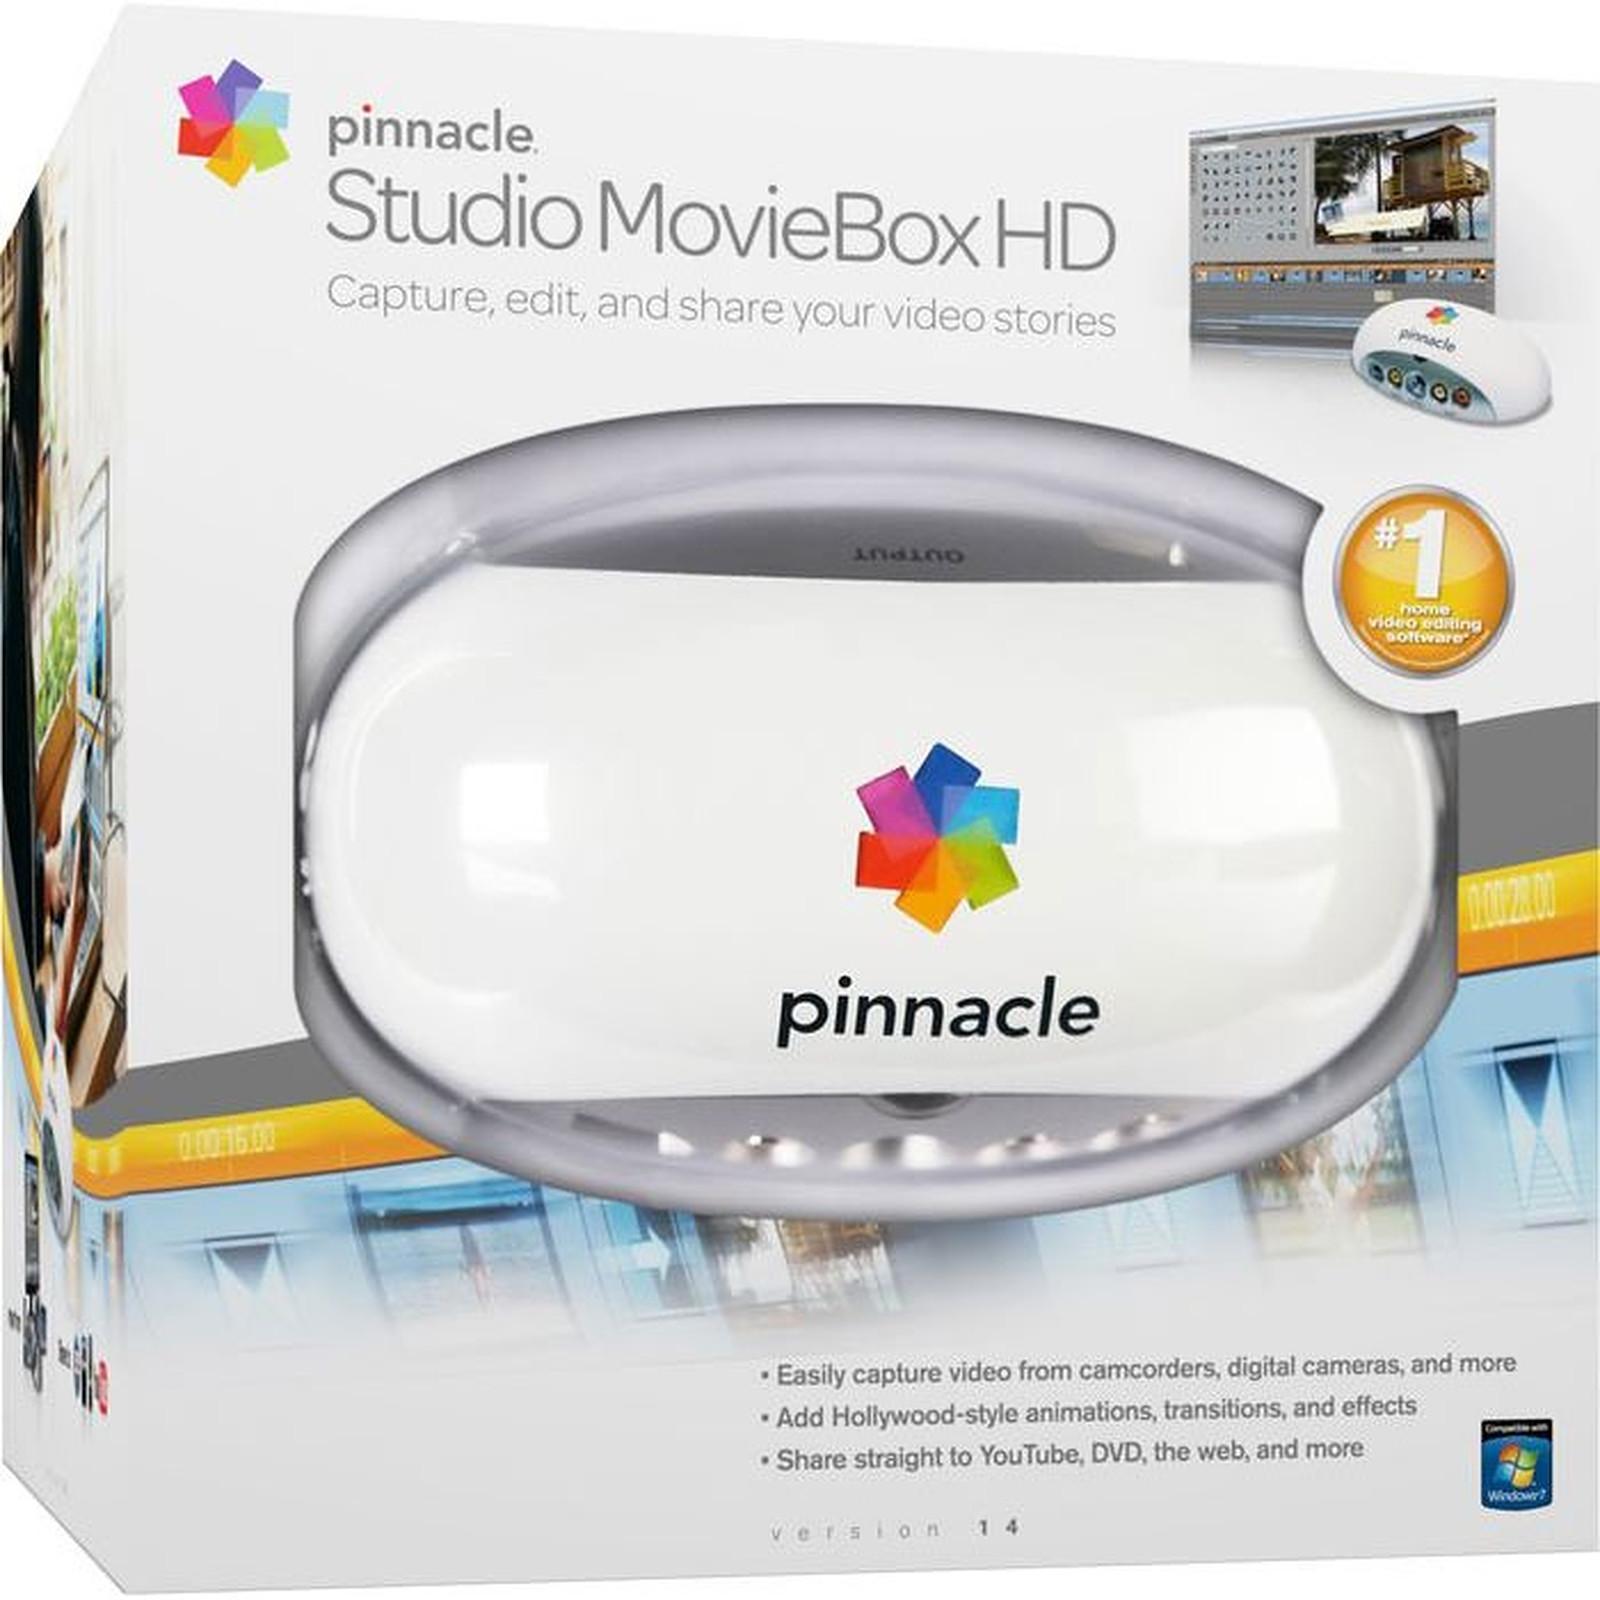 Pinnacle Studio MovieBox HD version 14